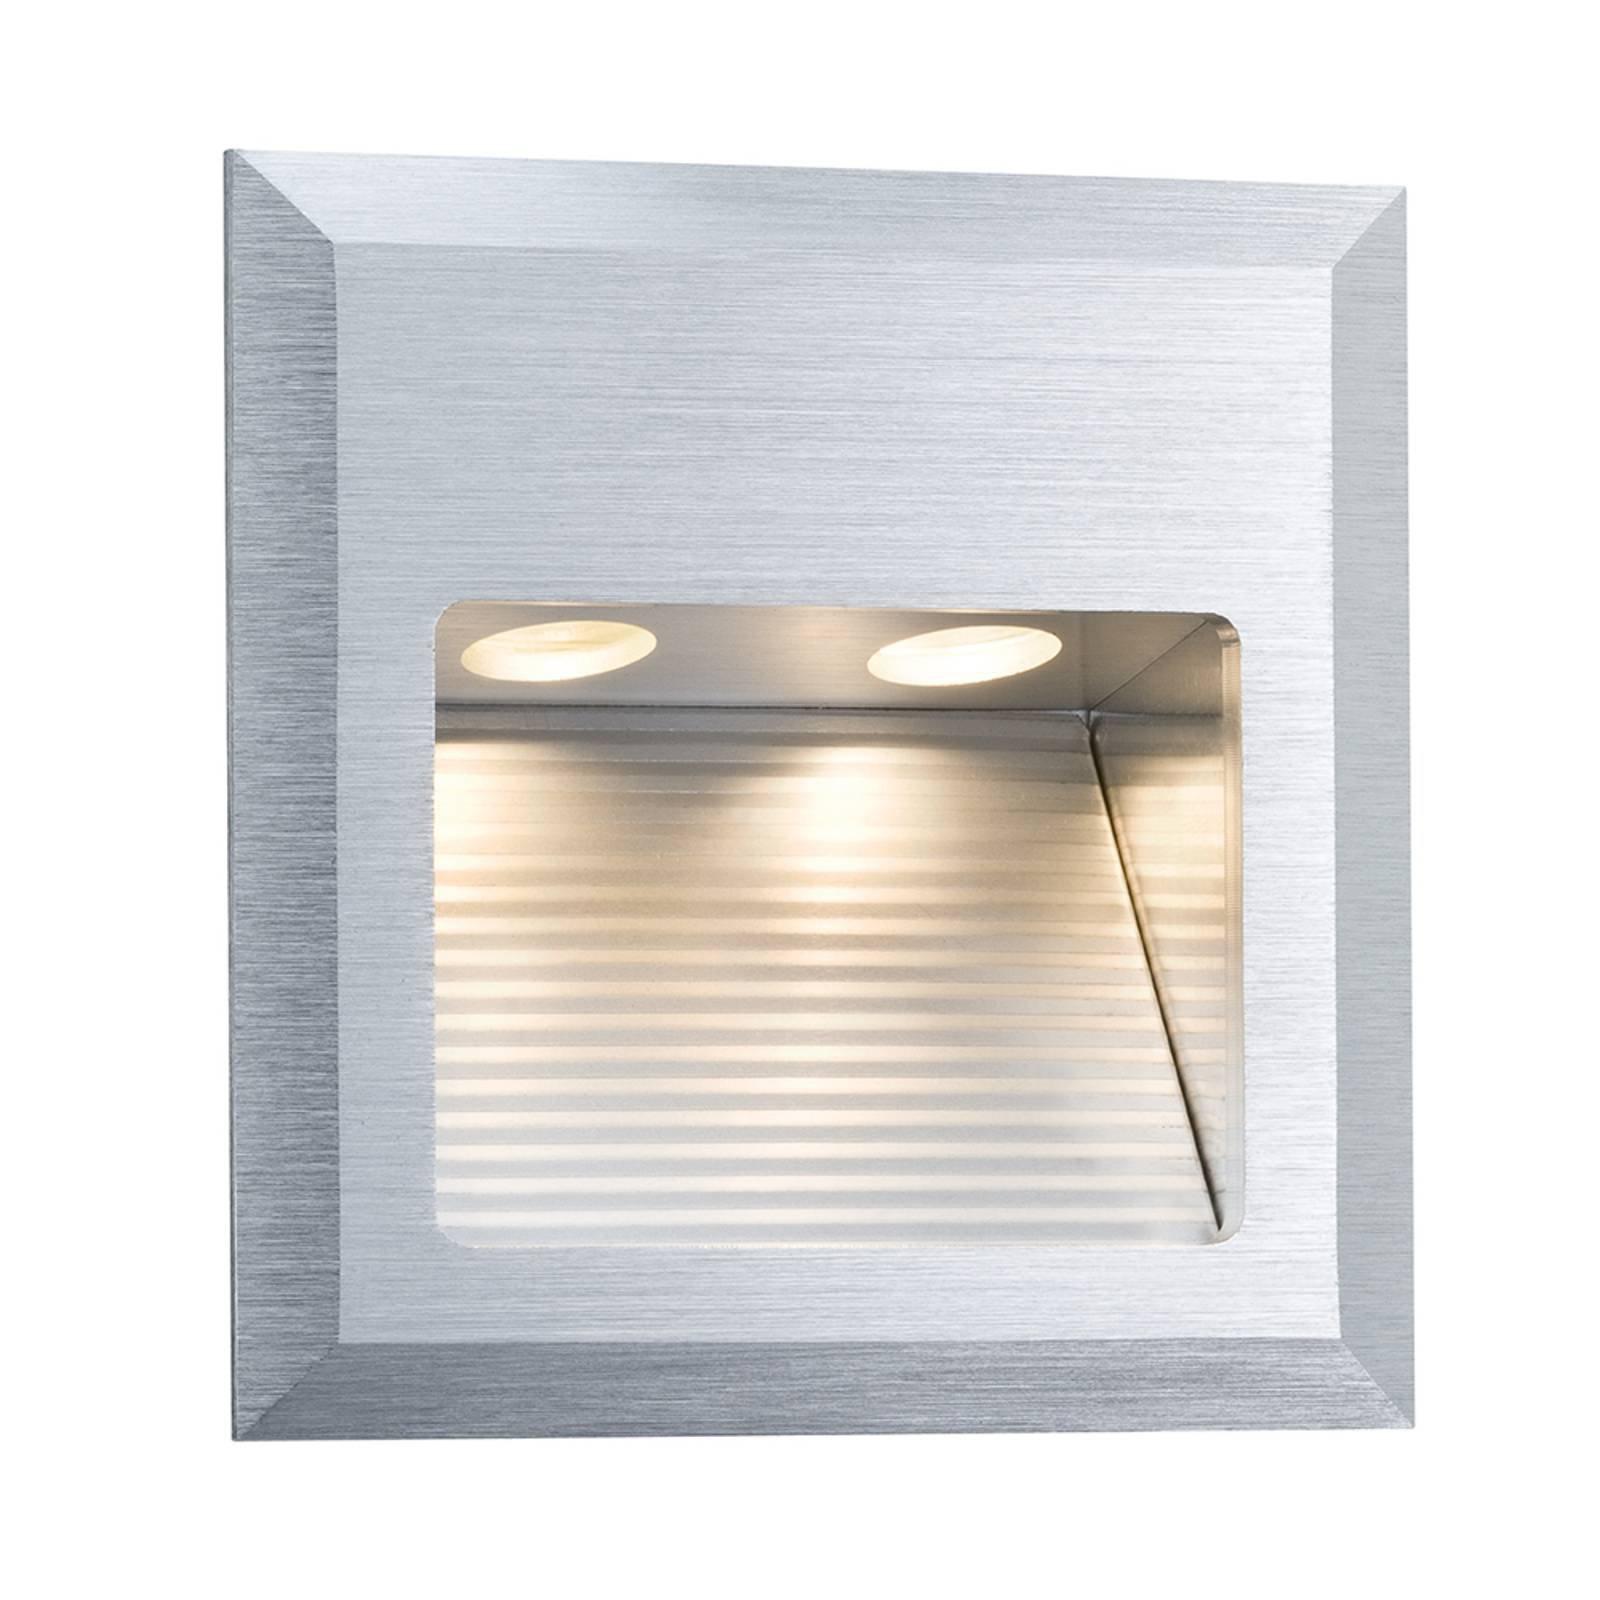 Special Line innfelt LED-veggspot med to lys